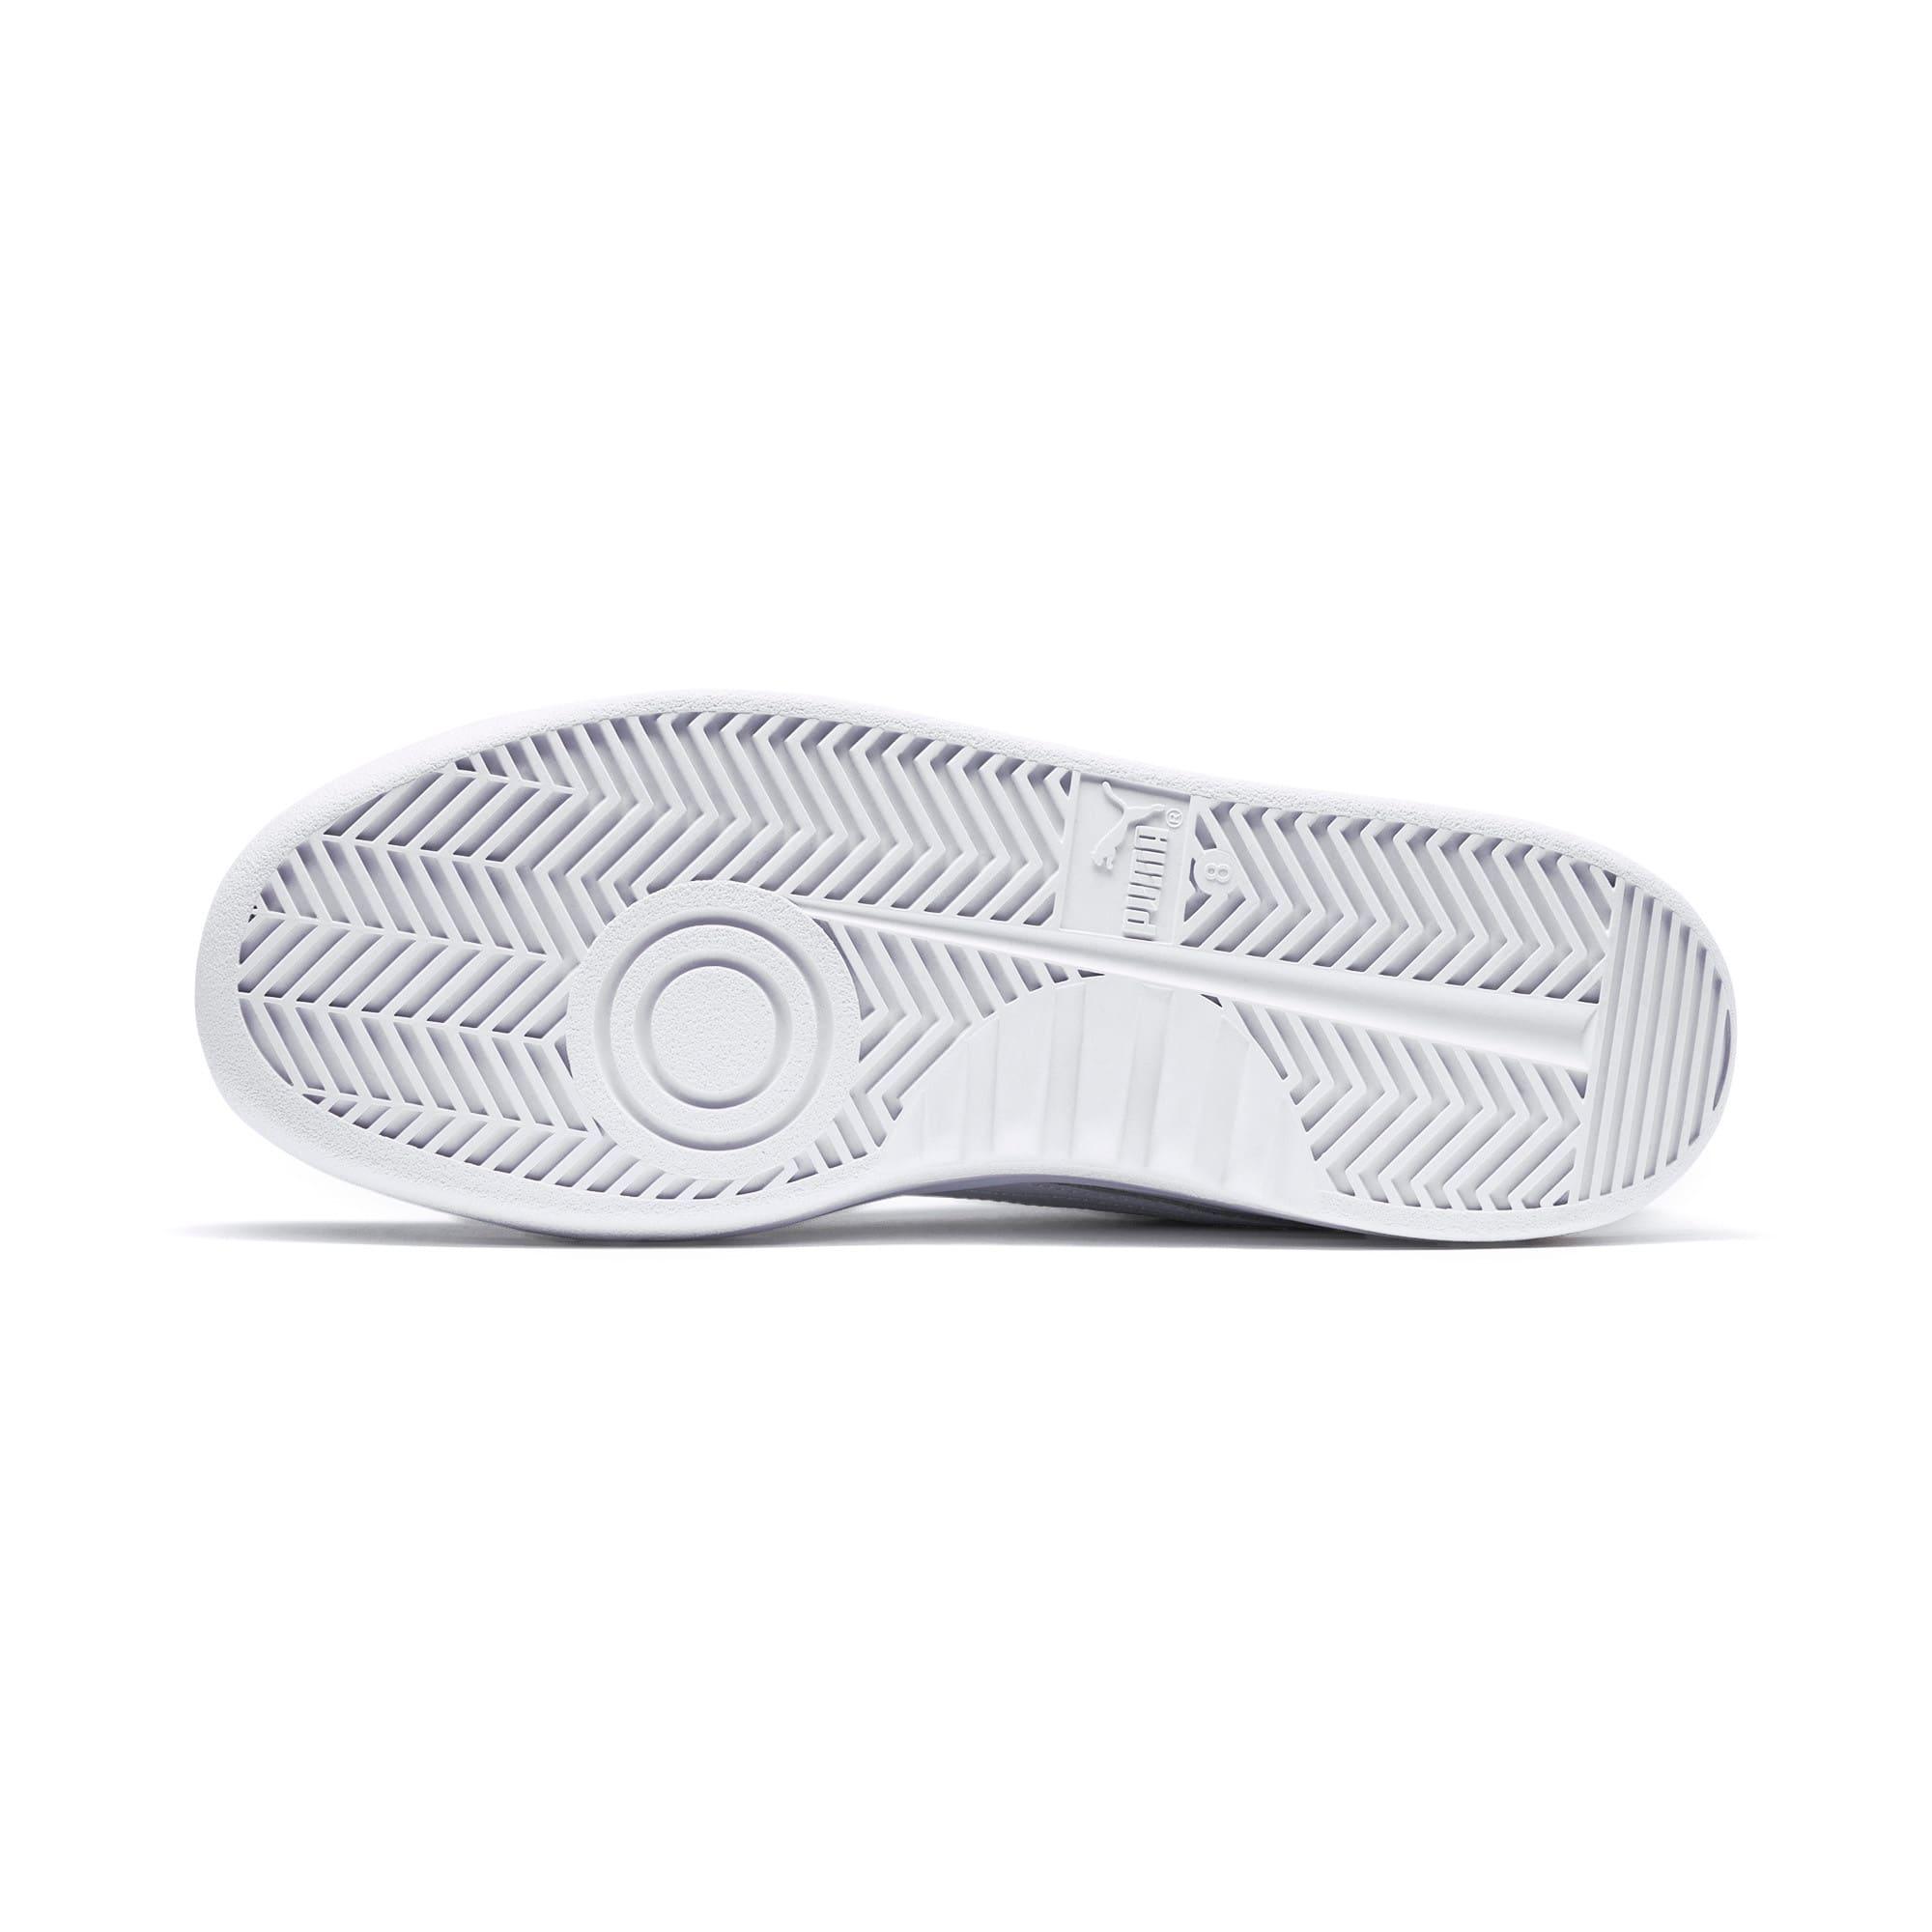 Thumbnail 5 of California Drive Thru schoenen, P Wht-HighRiskRed-Blazg Yelw, medium